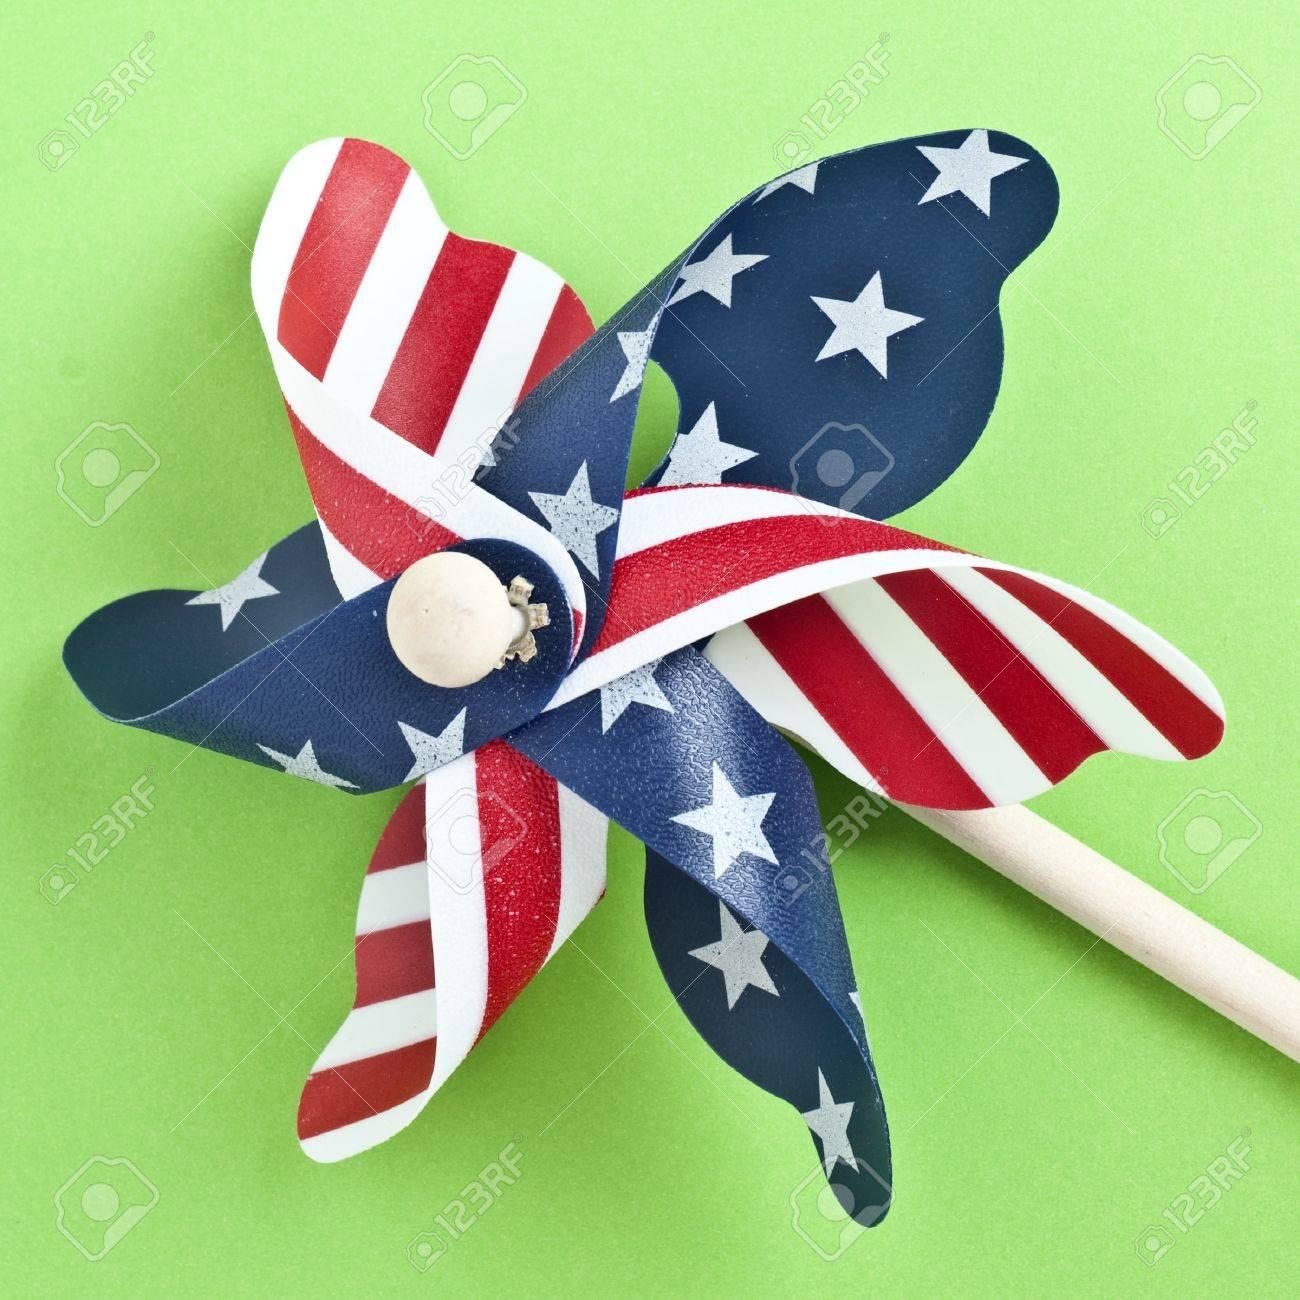 American Flag Patriotic Pinwheel on a Vibrant Green Background. Stock Photo - 8135240